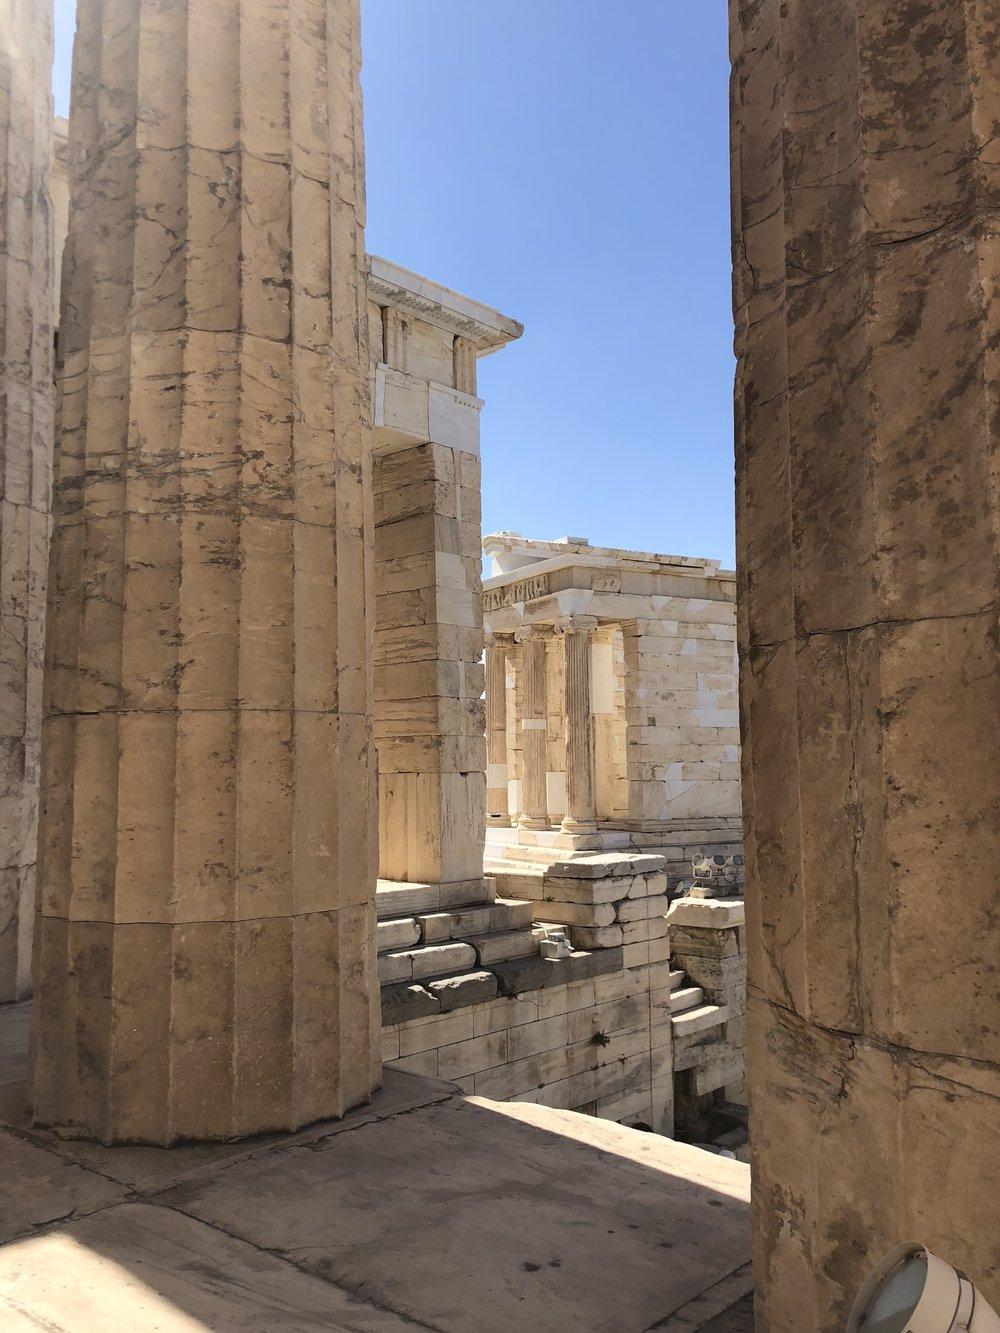 View of the Sanctuary of Athena Nike through the Propylaea's Entranceway